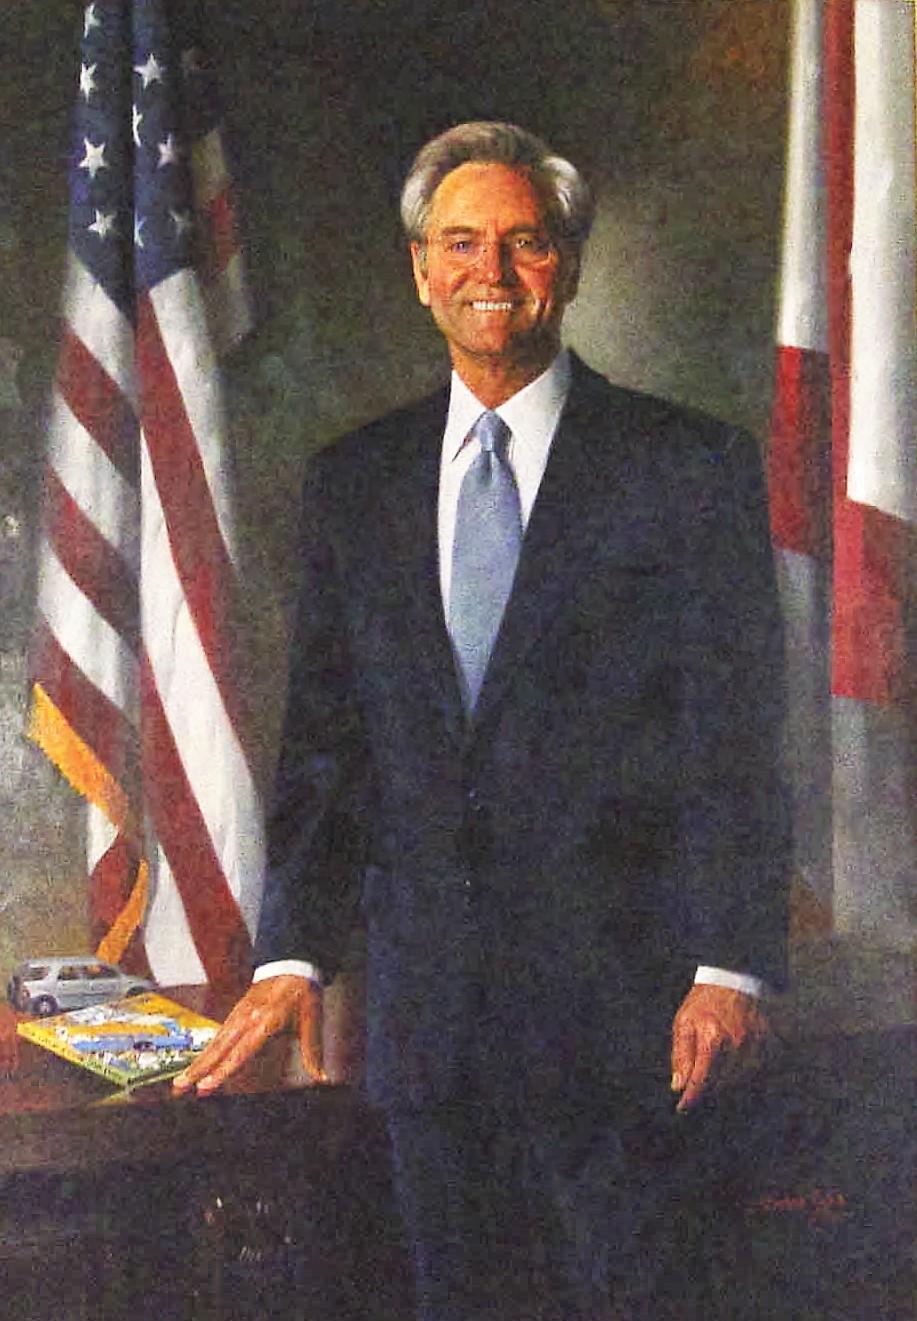 Former Alabama Governor, Don Siegelman